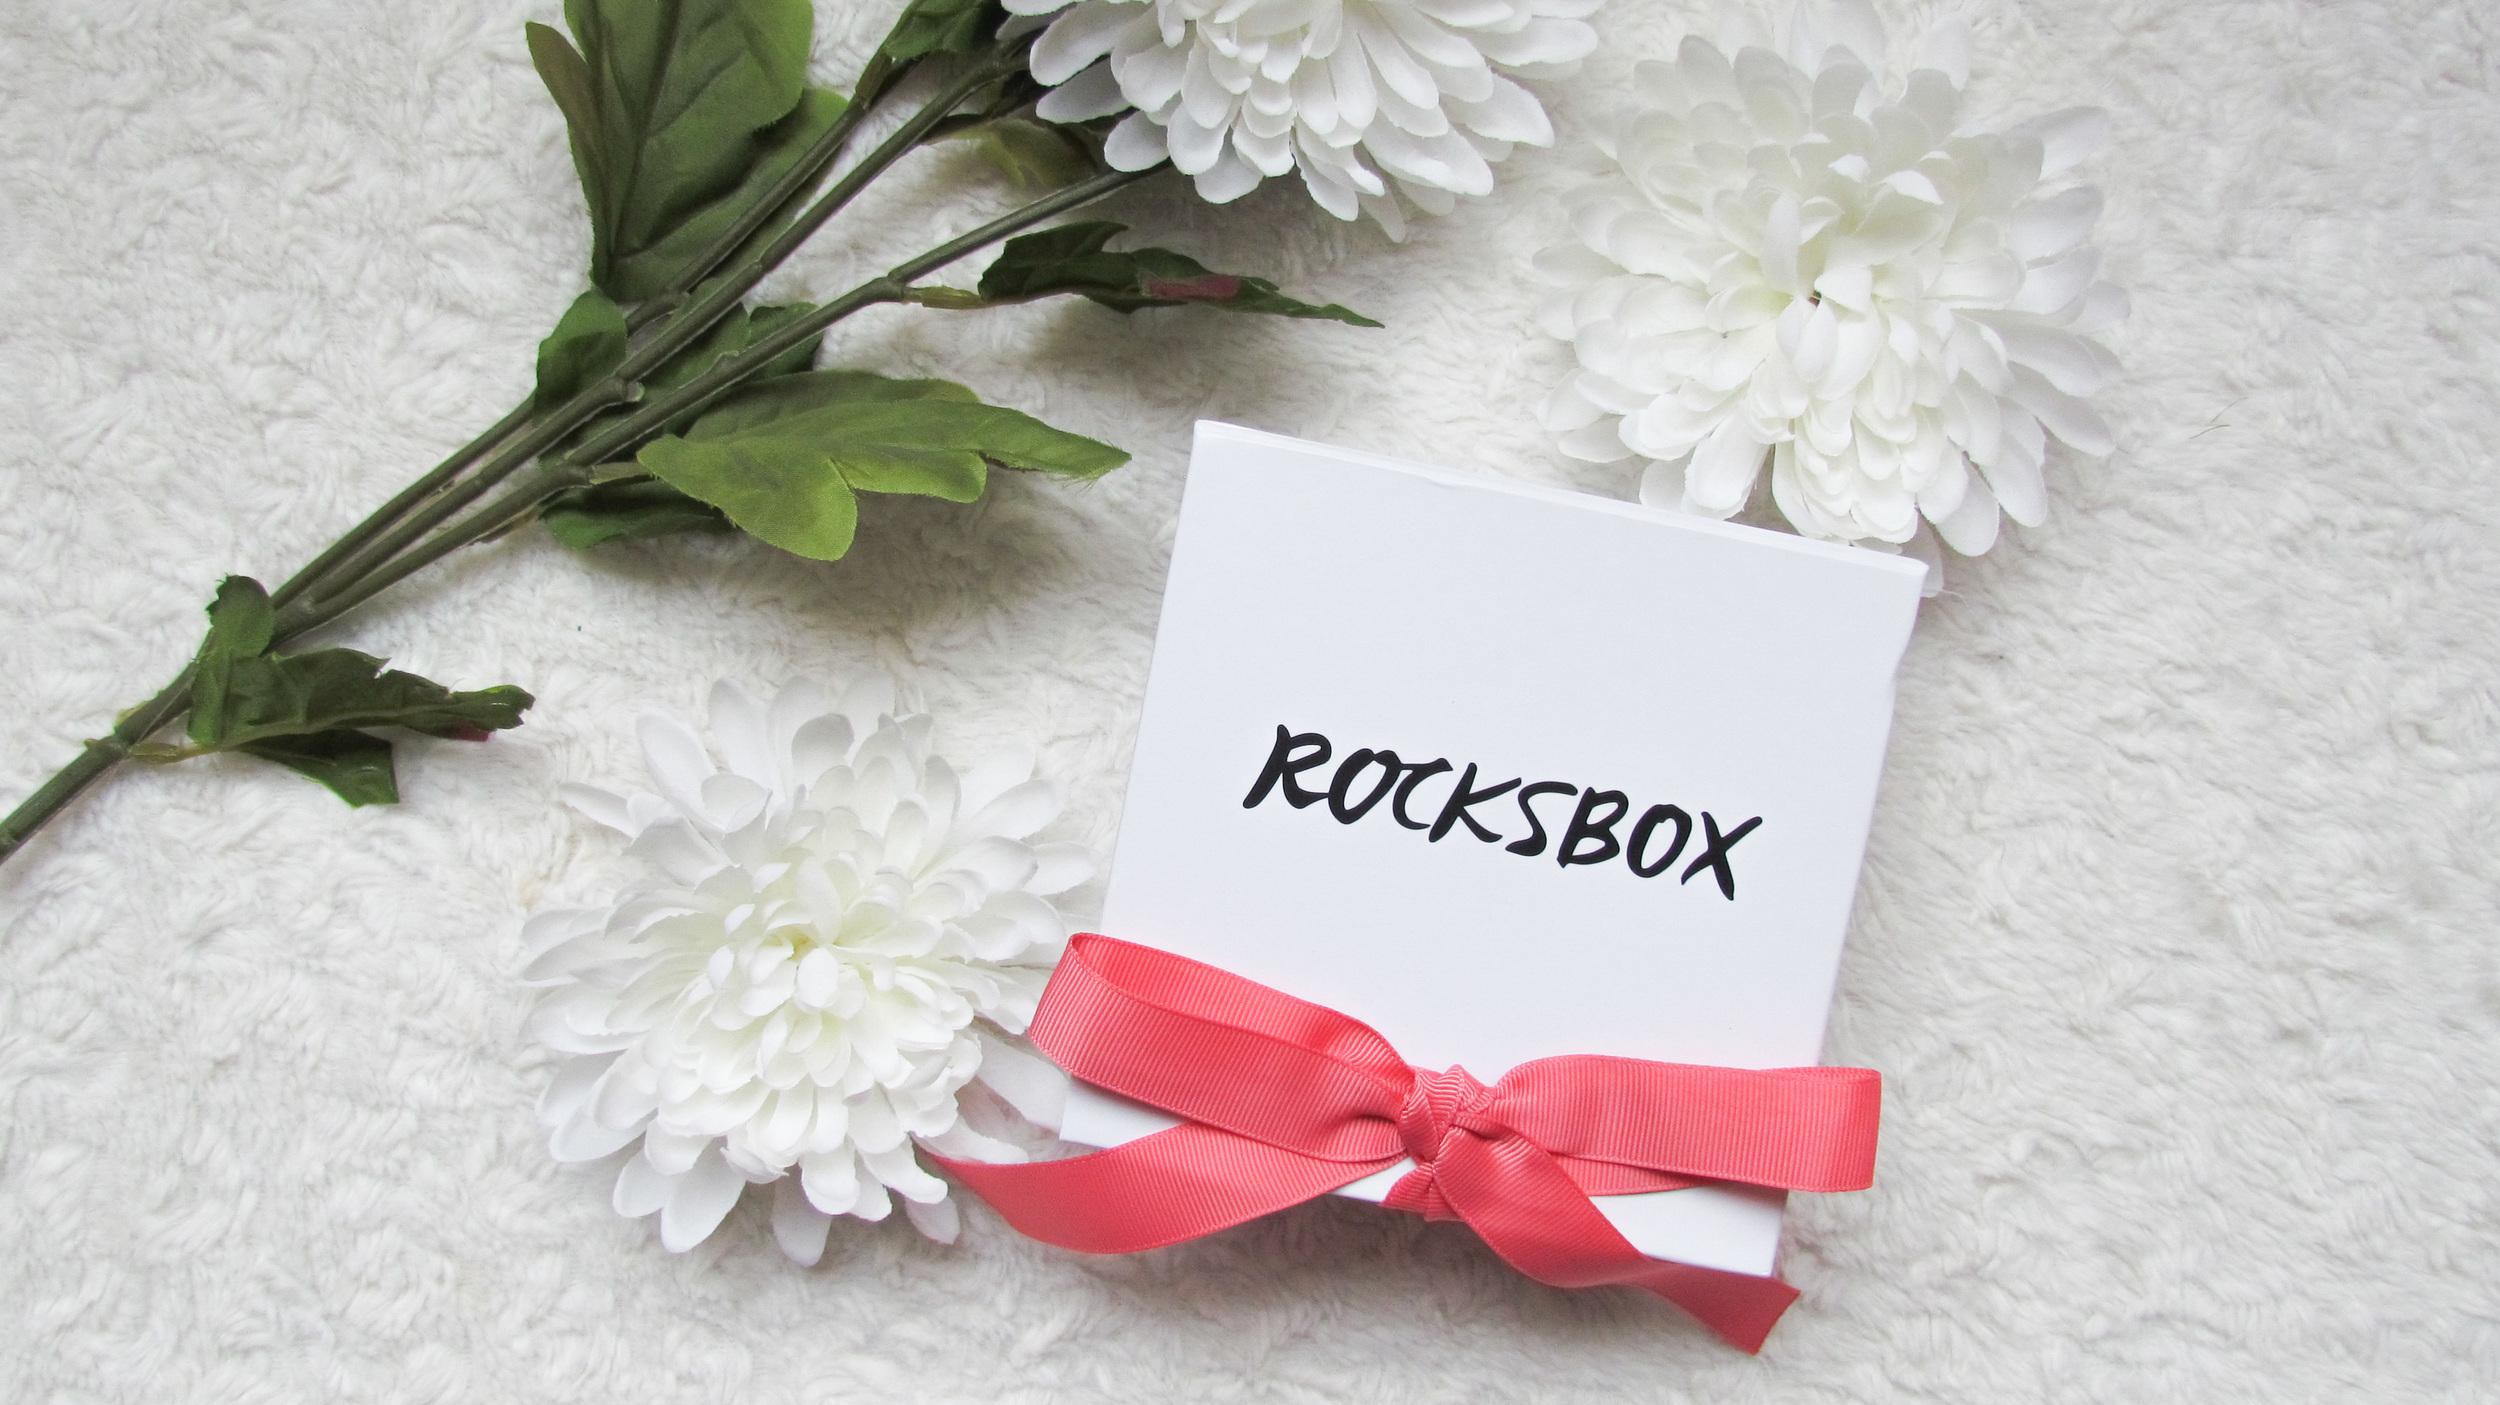 April Rocksbox - Southern New Yorker